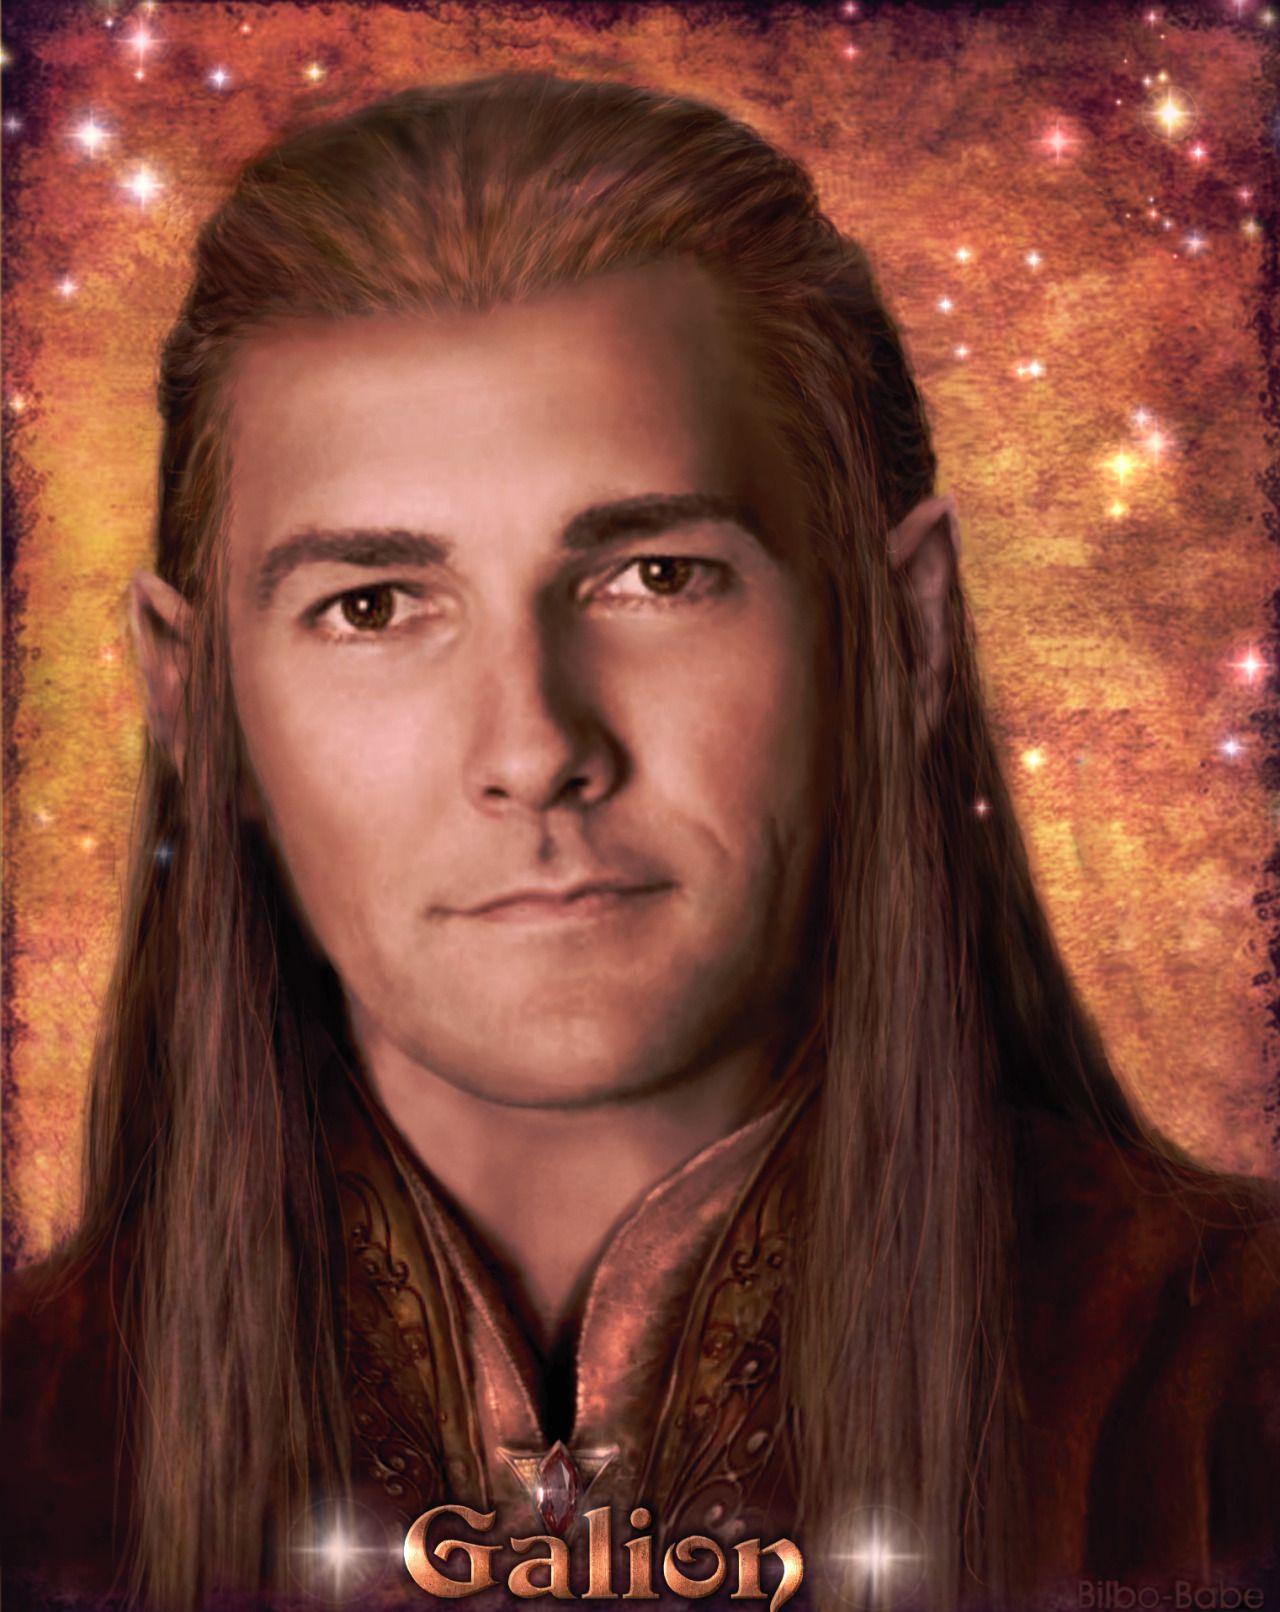 ��elves�� from mirkwood rivendell lothlorien elros